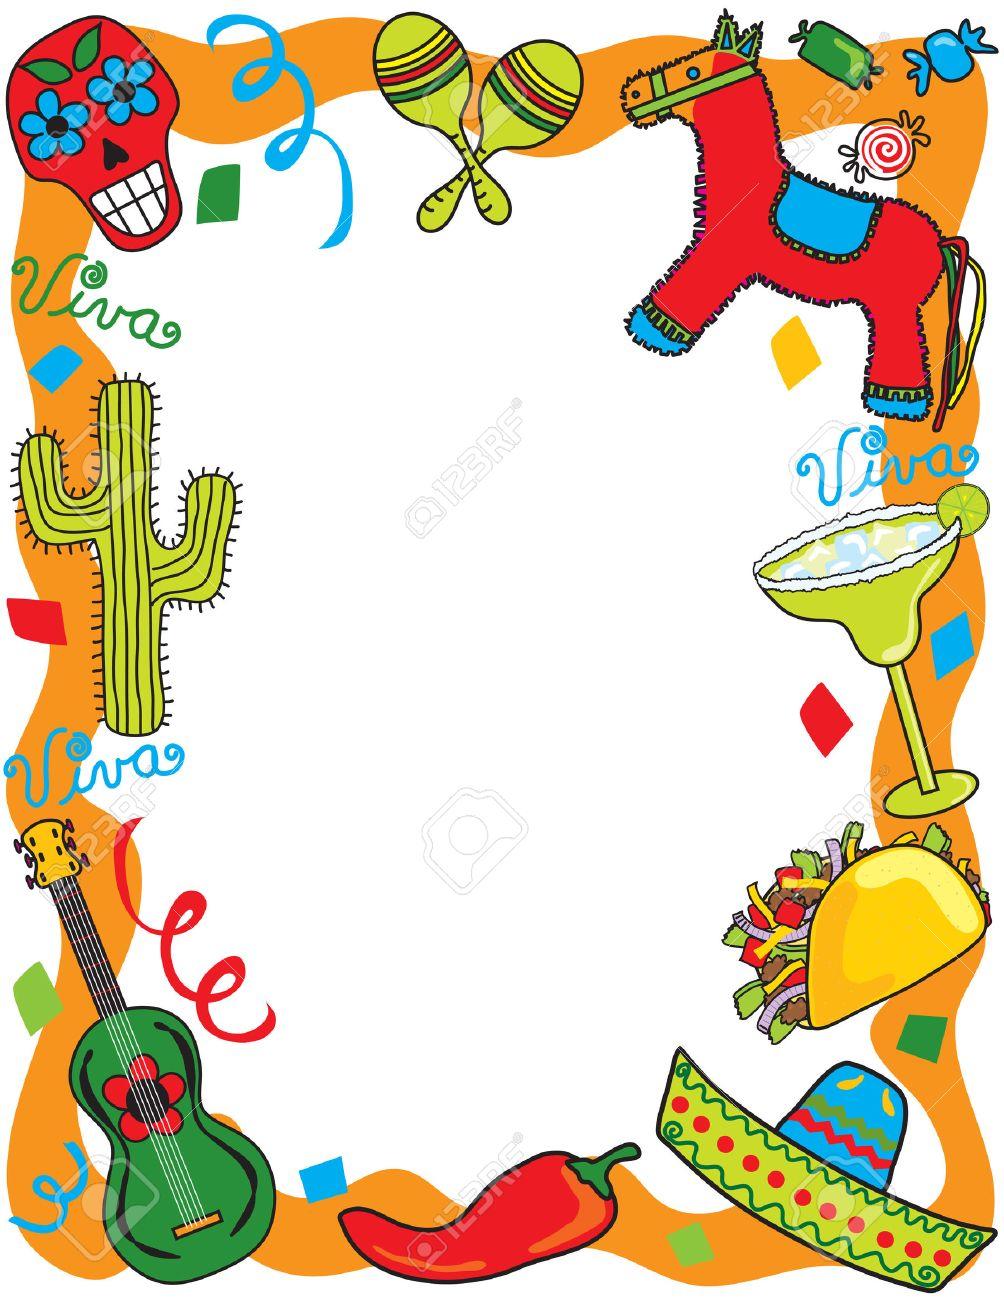 Mexican Fiesta Party Invitation Royalty Free Cliparts, Vectors ...